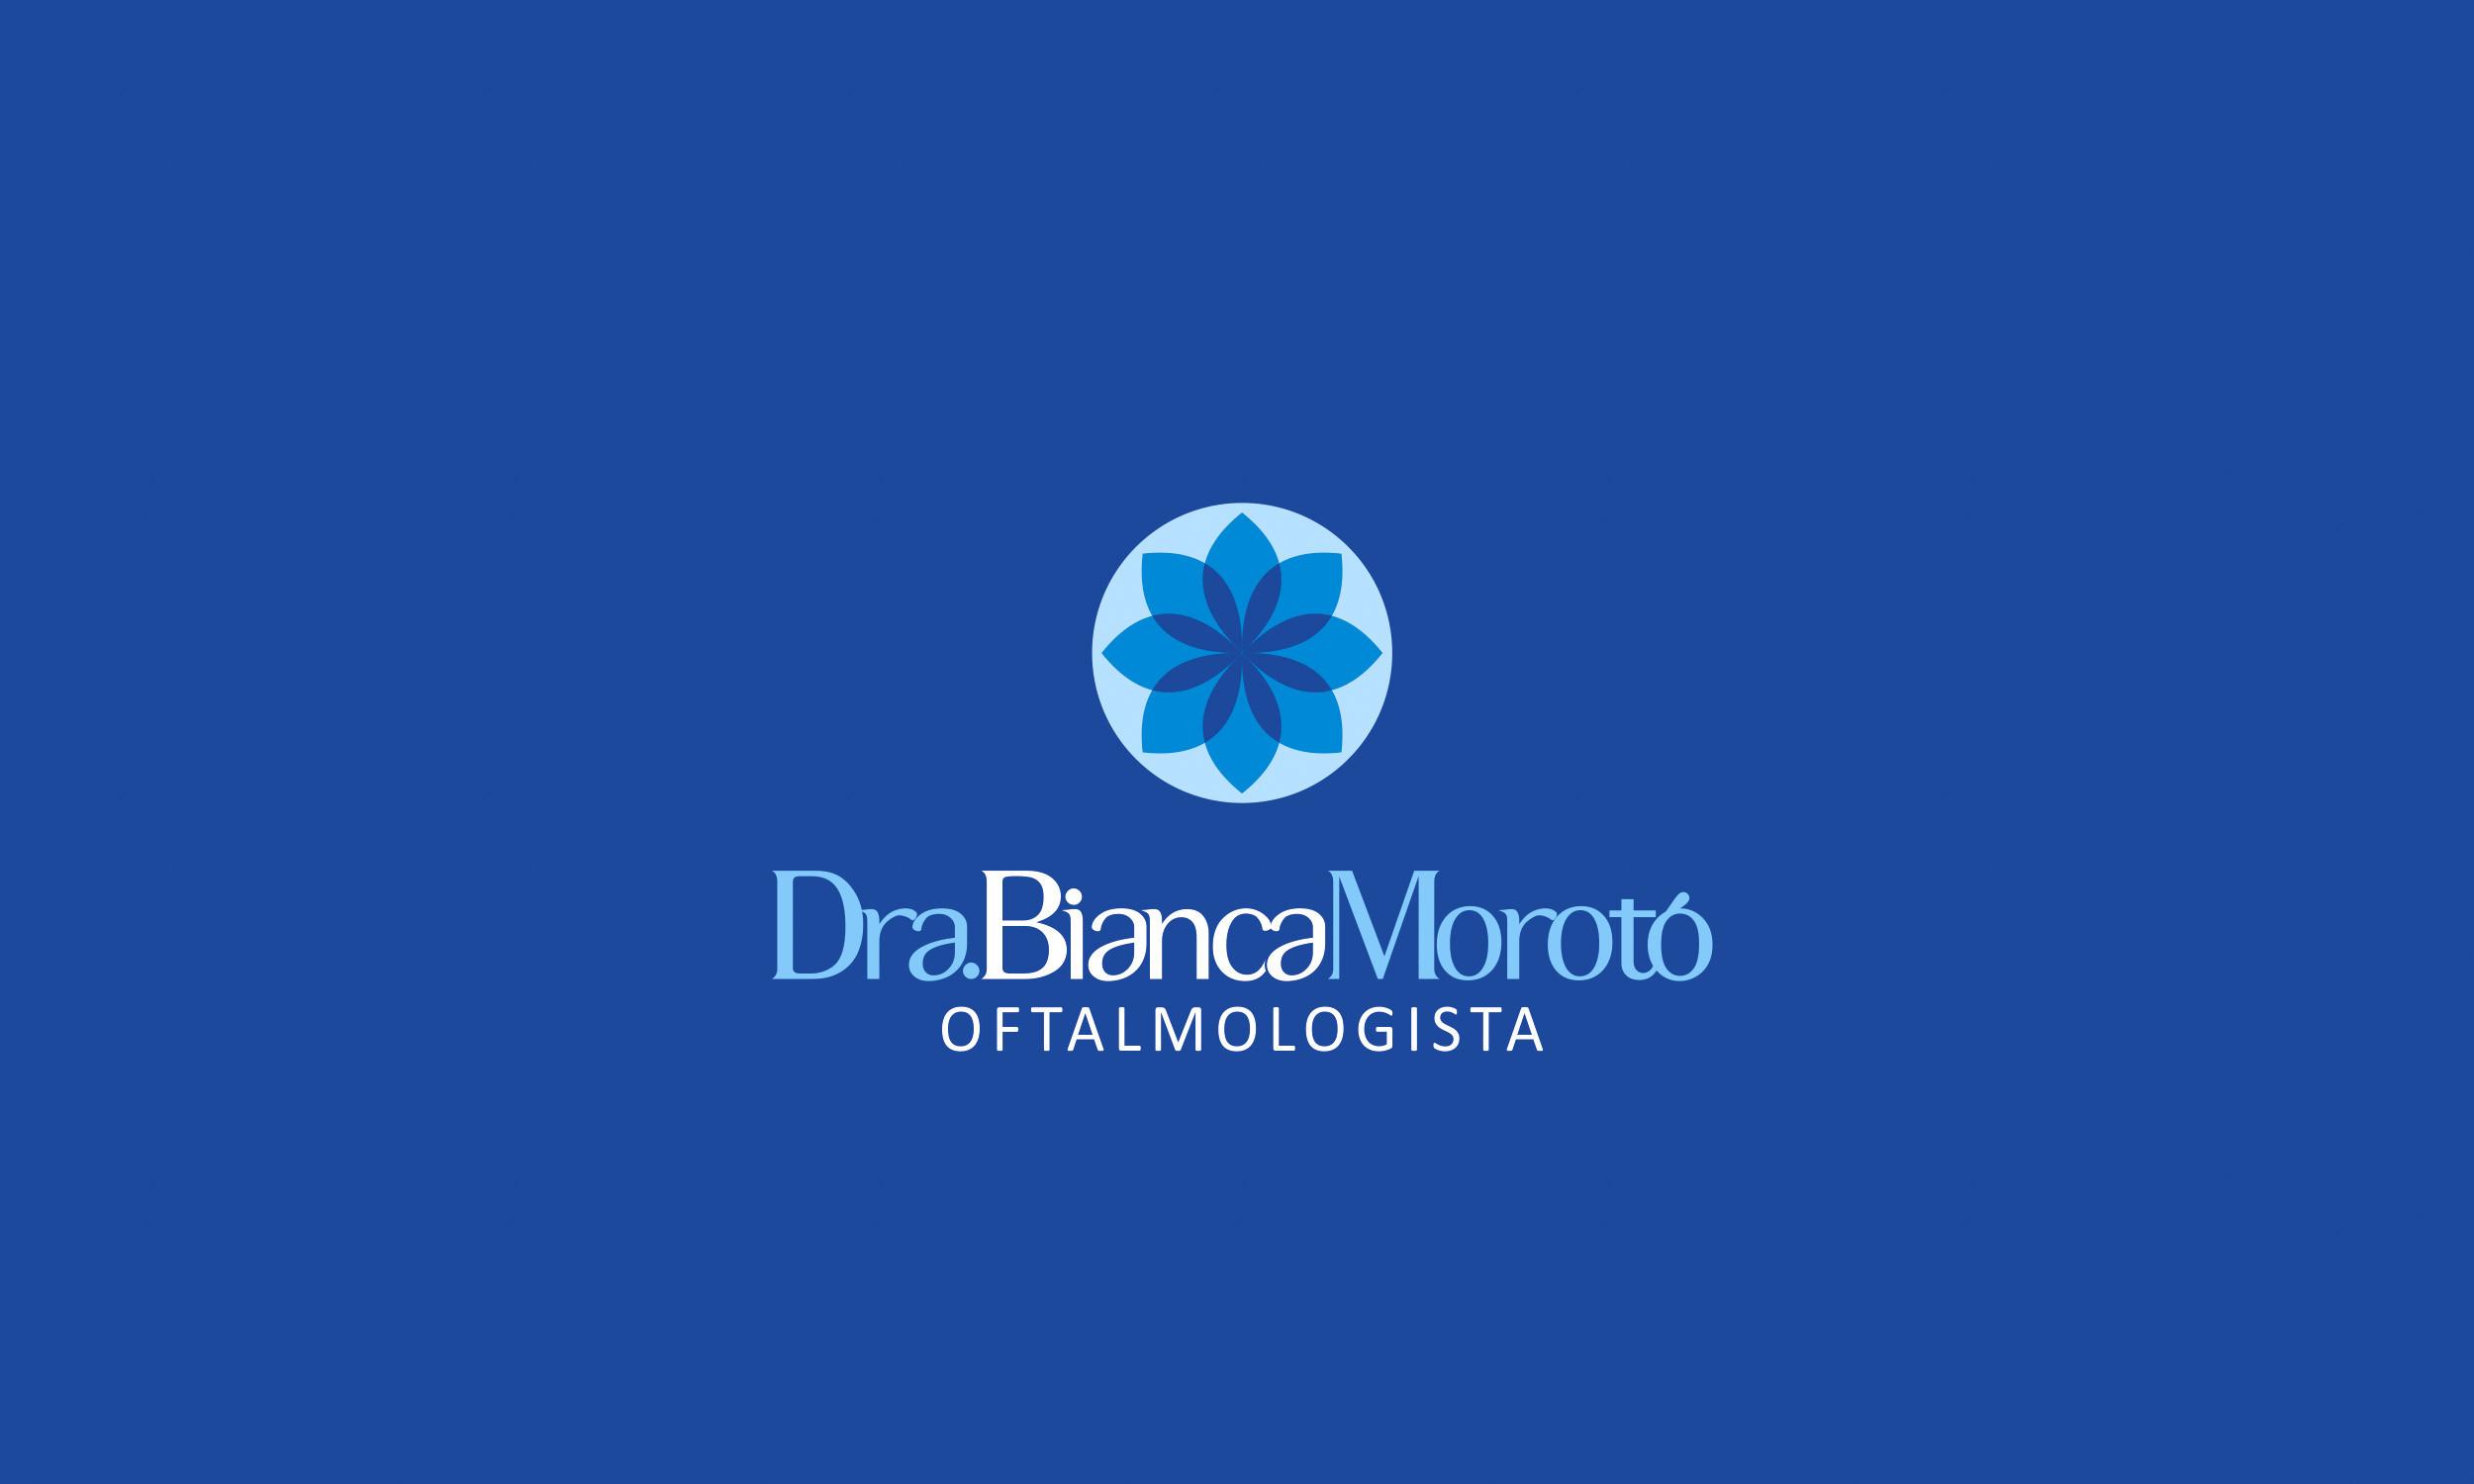 Dra. Bianca Mororó